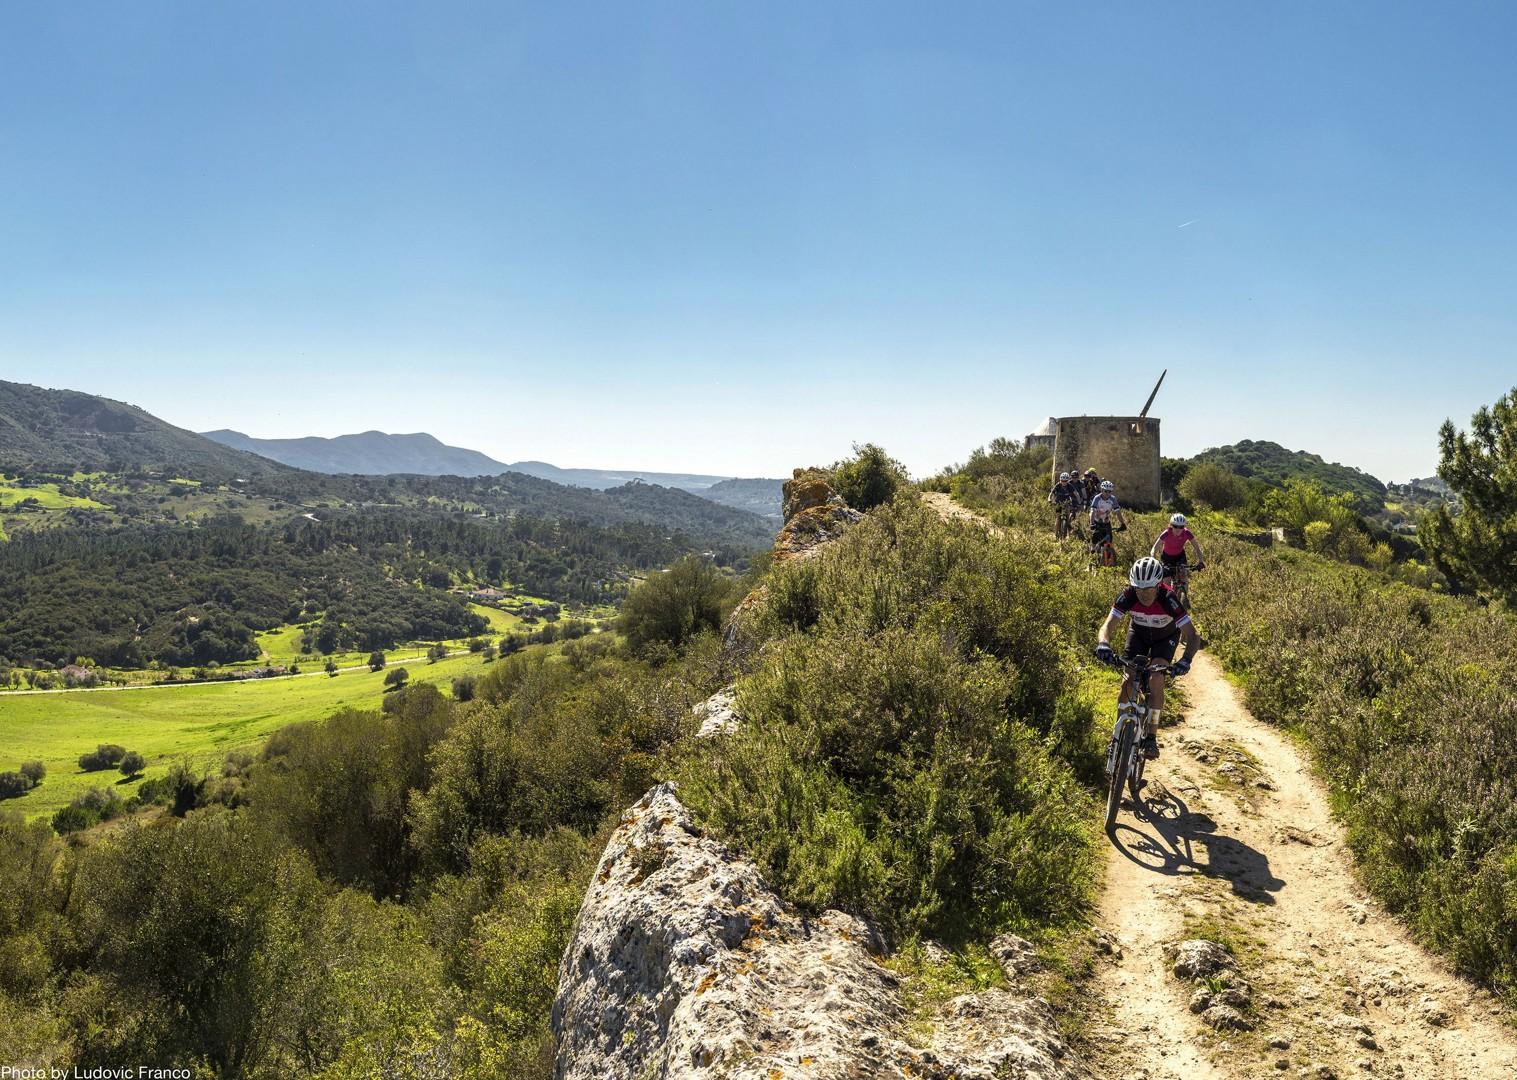 group-singletrack-exploration-cycling-holiday-on-atlantic-coast-portugal.jpg - Portugal - Atlantic Trails - Guided Mountain Bike Holiday - Mountain Biking